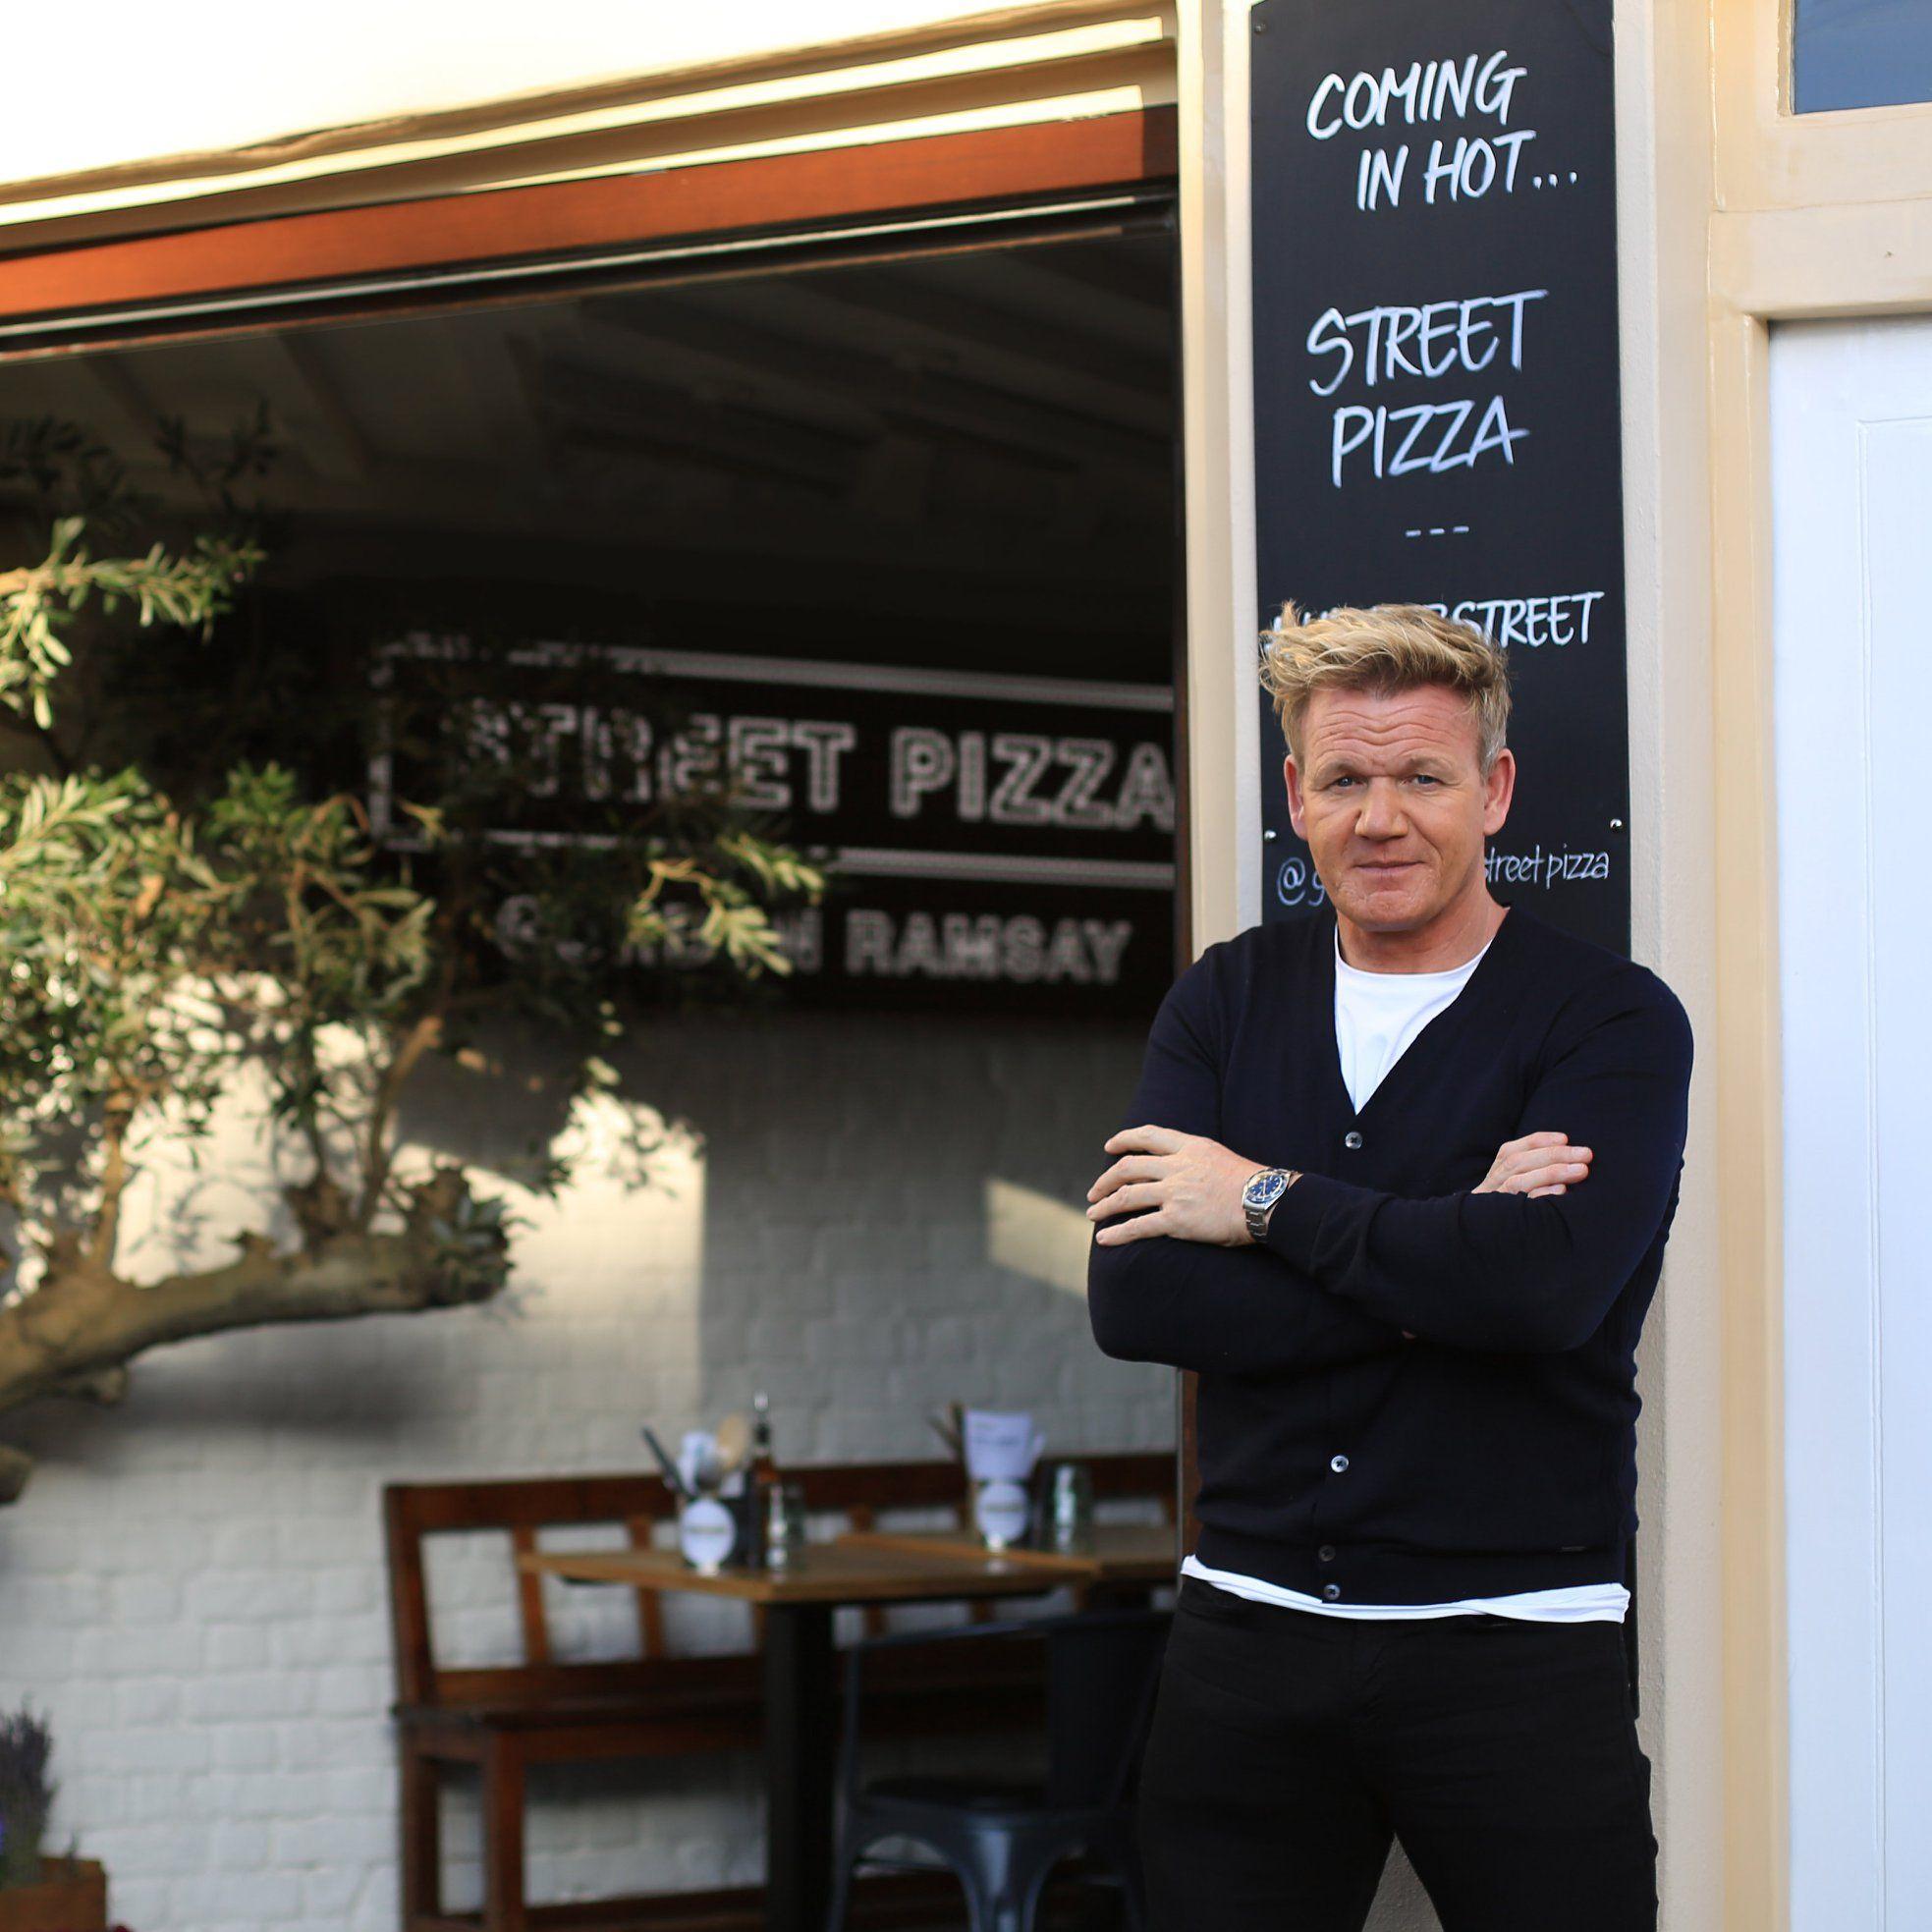 Gordon Ramsay's new pizza restaurant in London, Street Pizza. Photo: Gordon Ramsay official Facebook page